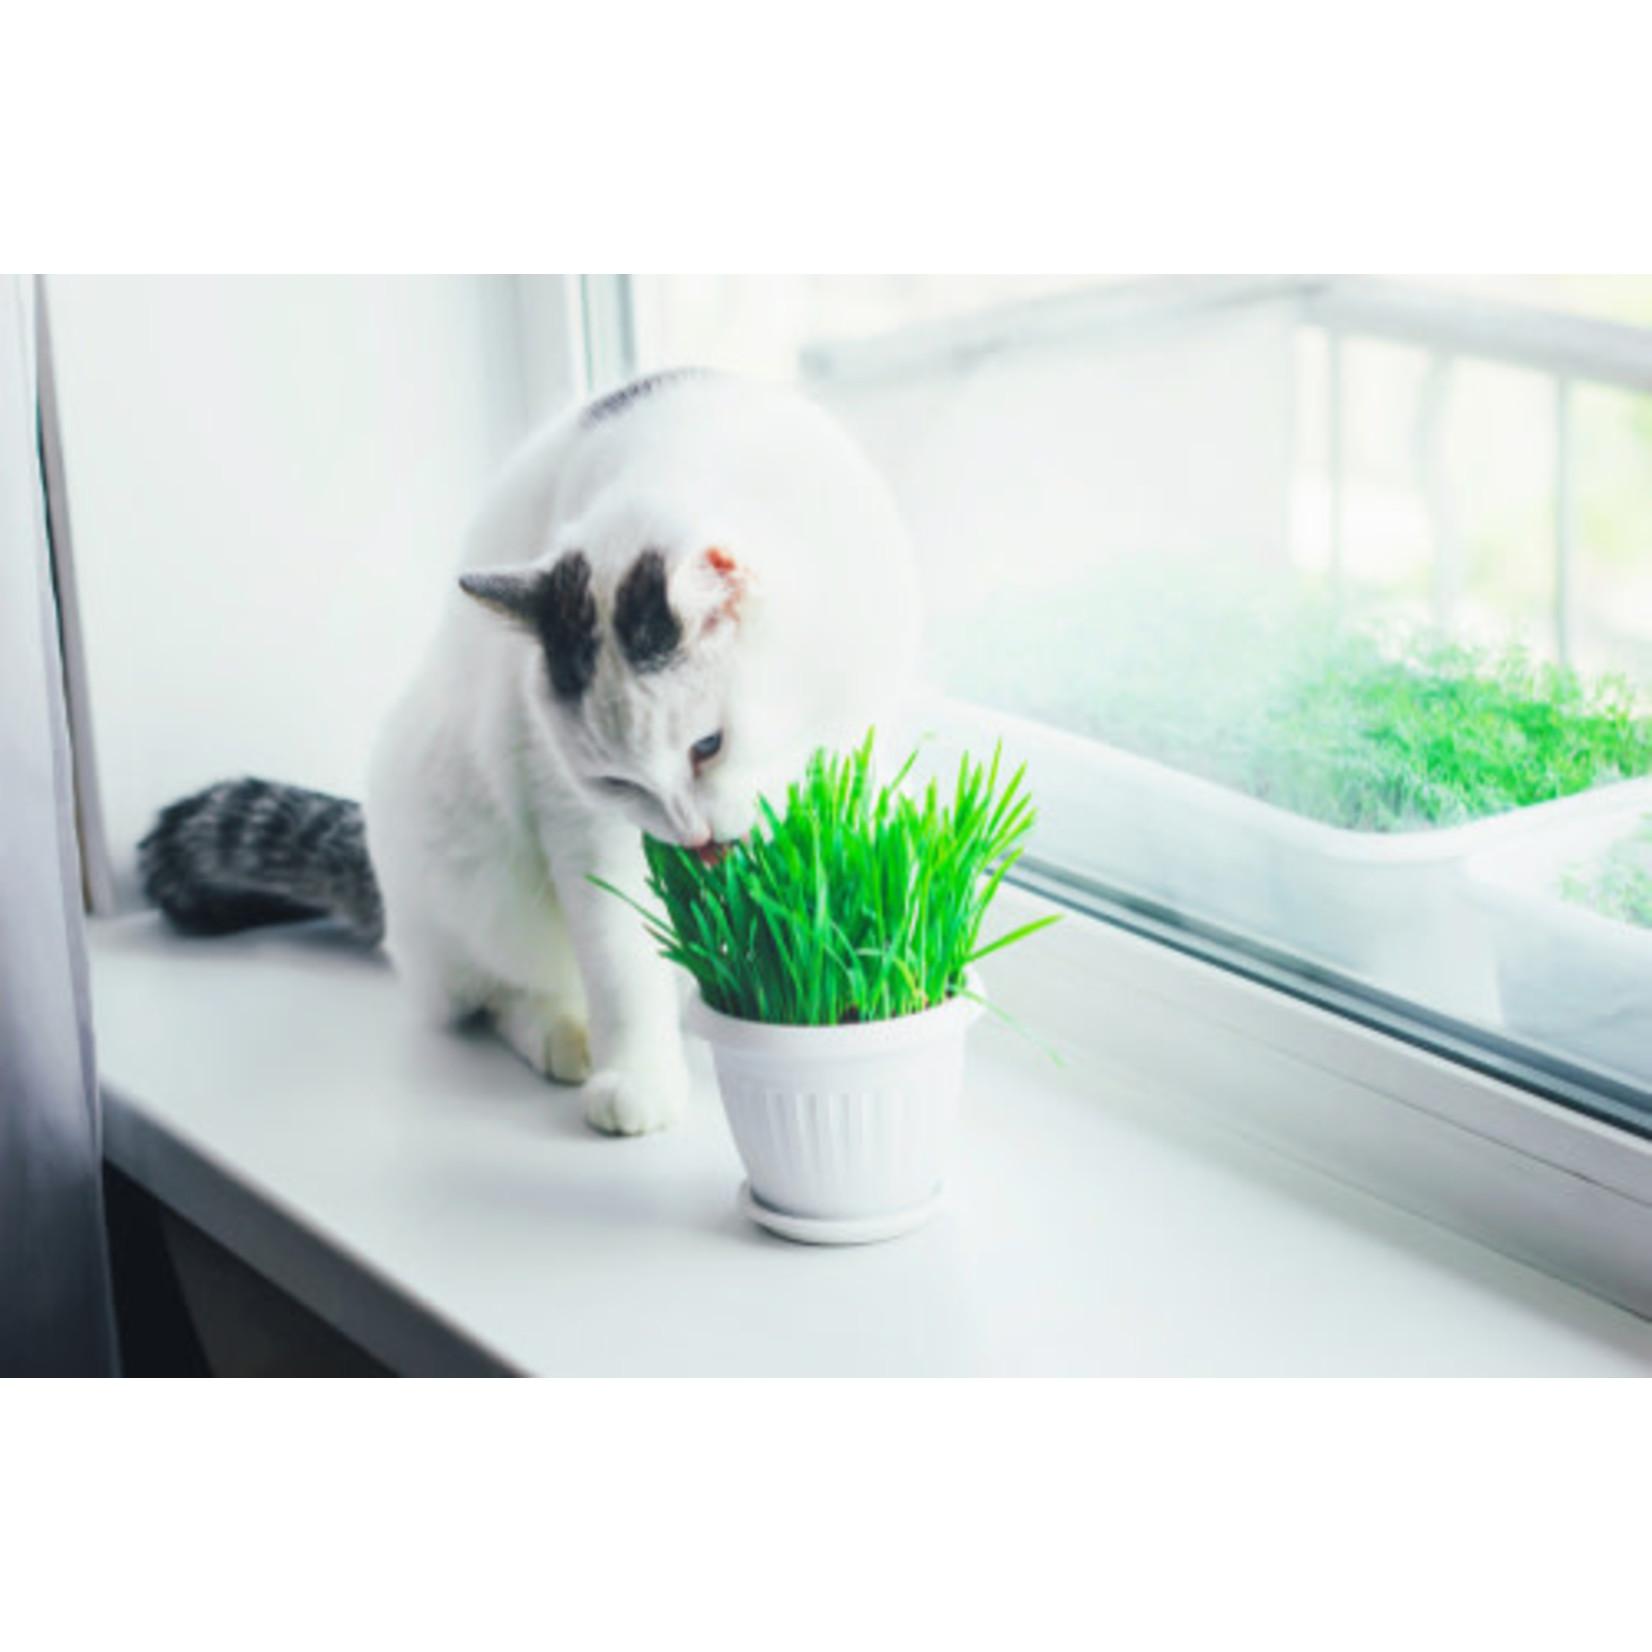 Catgrass (seed pkg) - Common